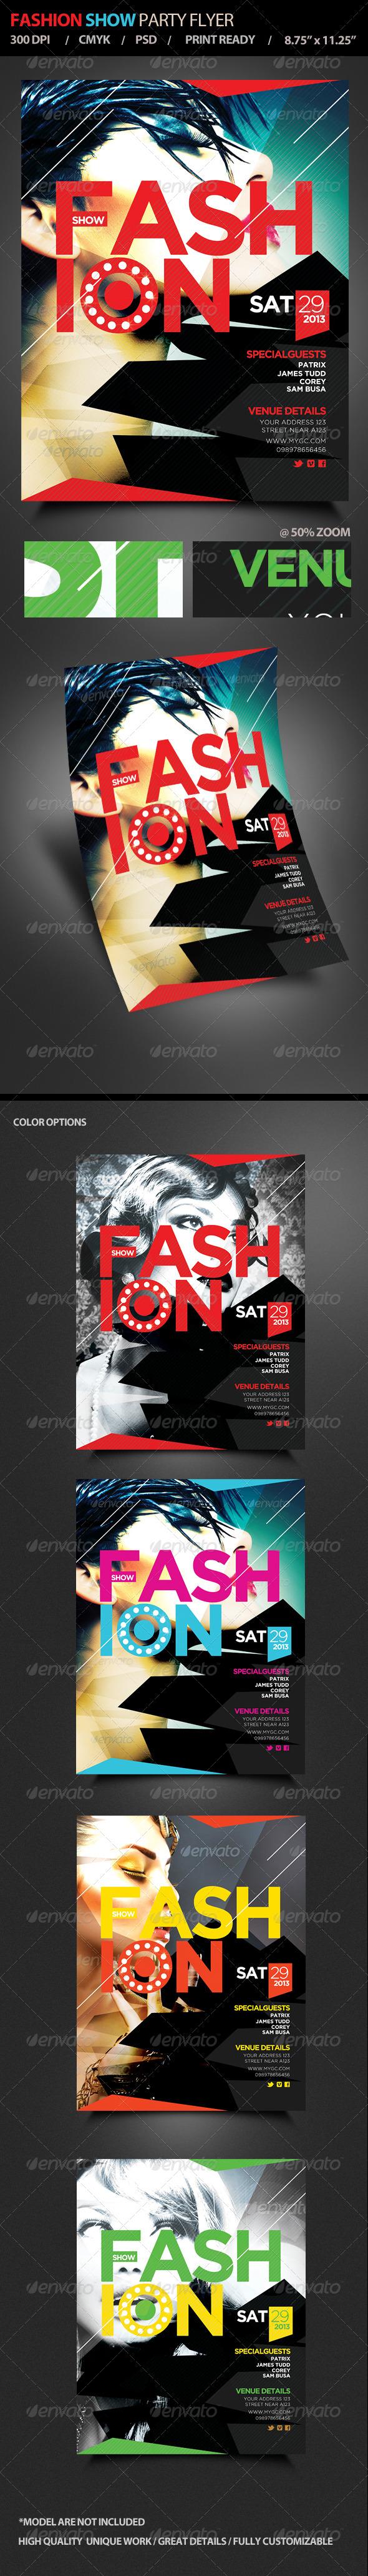 GraphicRiver Fashion Show Flyer Magazine Cover V2 4856302